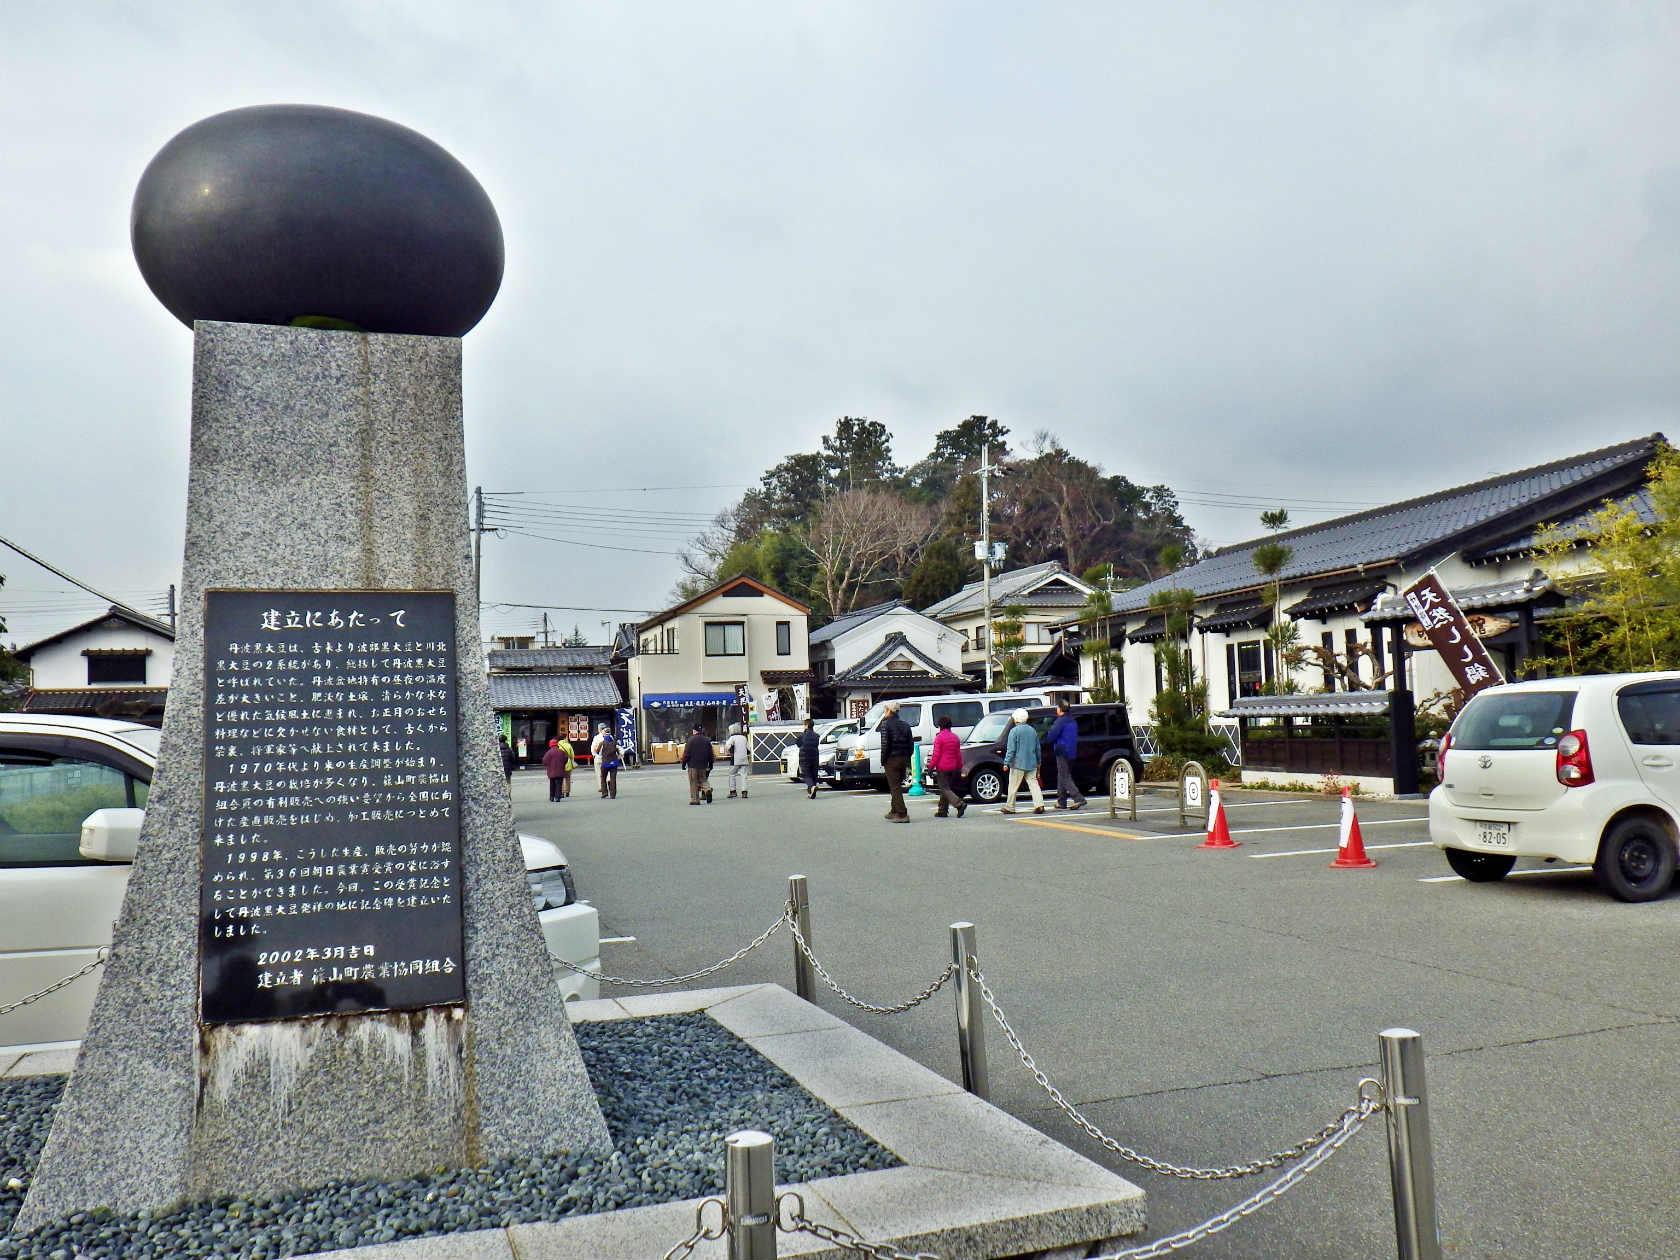 25a 丹波黒大豆発祥の地記念碑